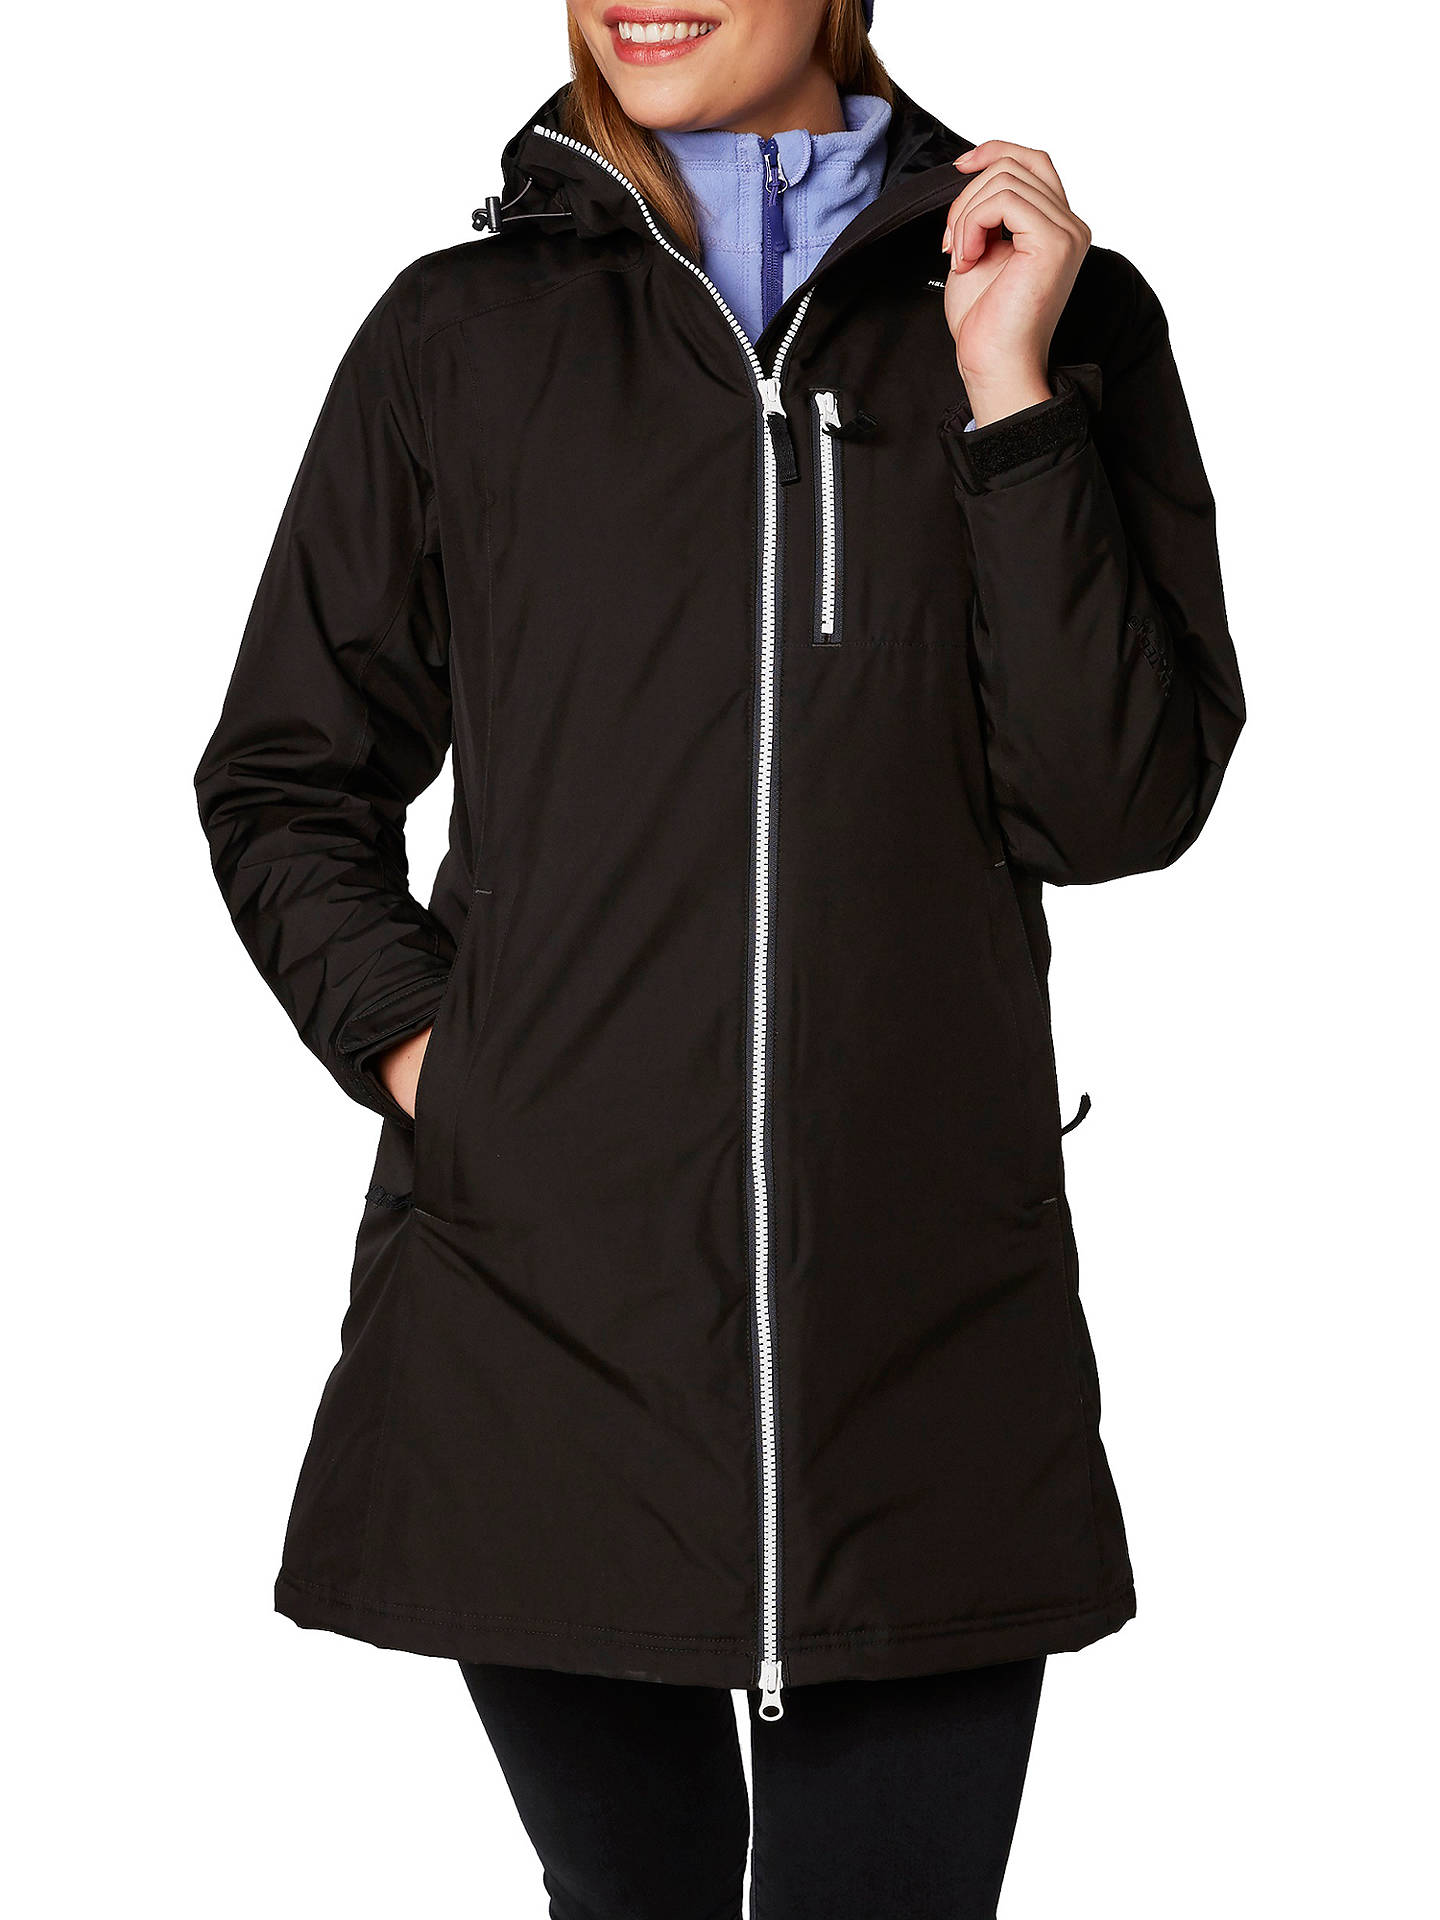 333673e2980 Helly Hansen Long Belfast Waterproof Insulated Women s Jacket at ...